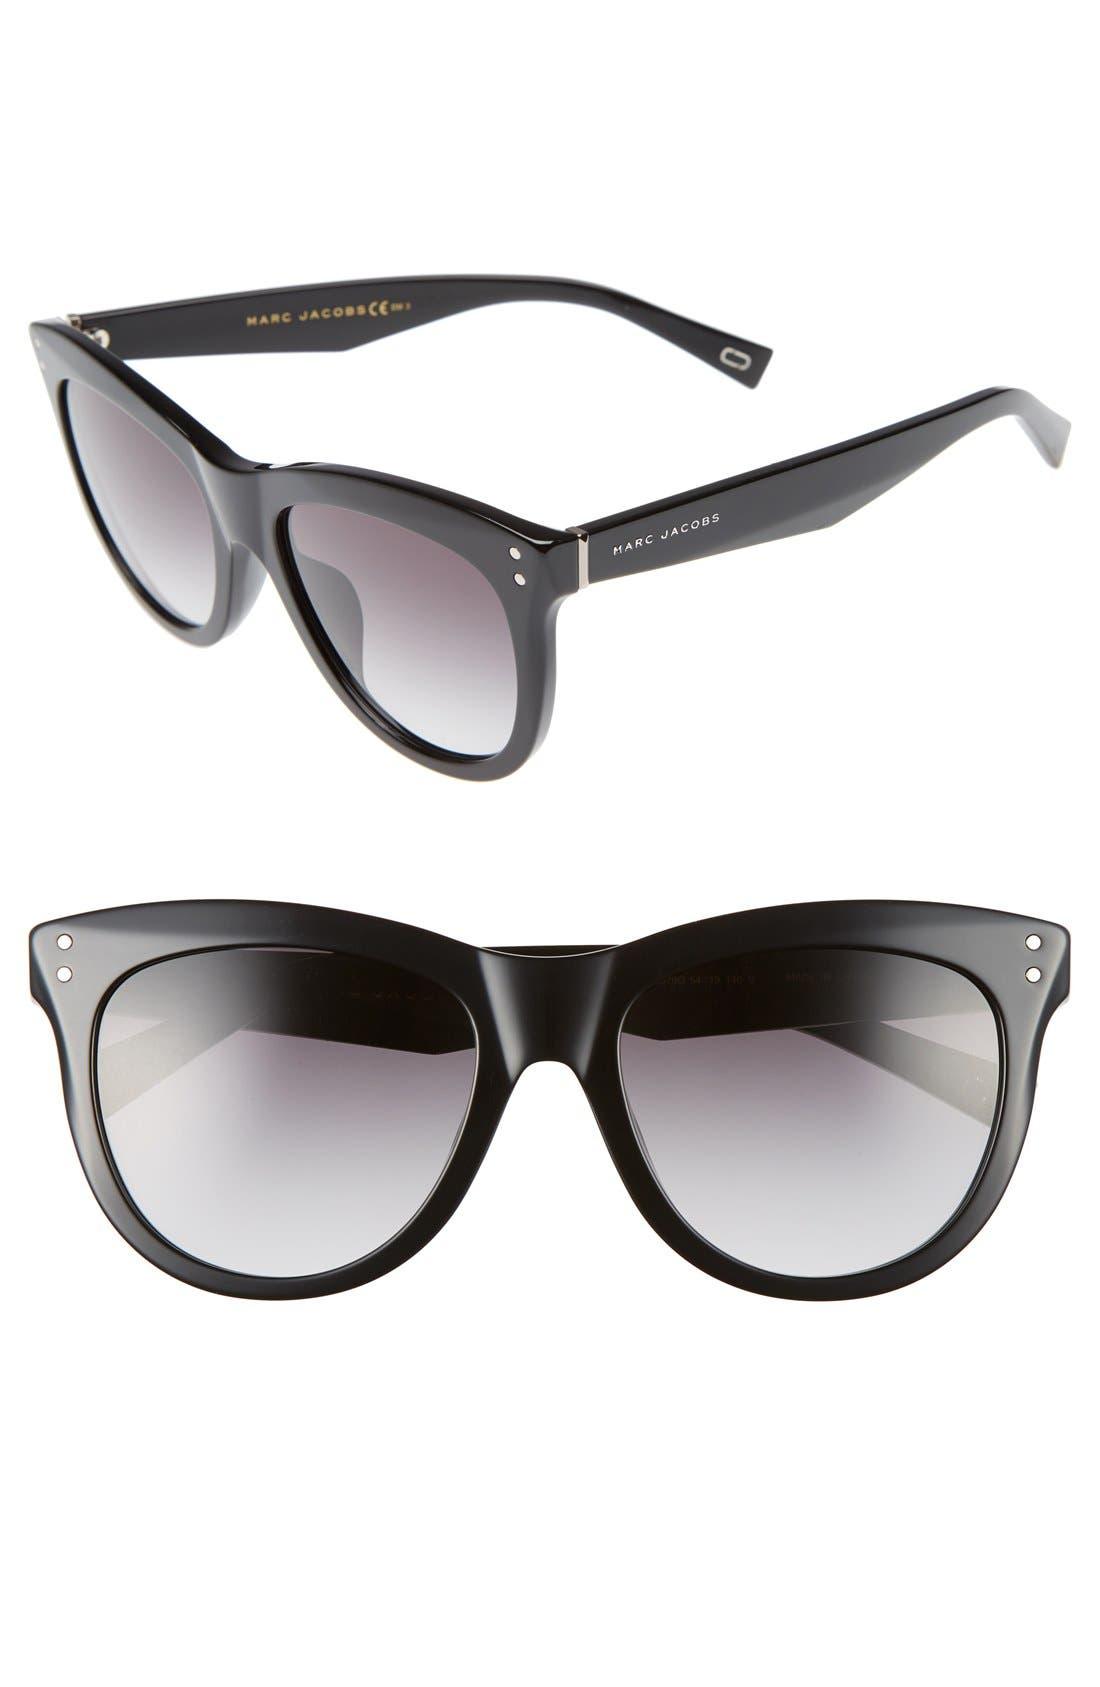 MARC JACOBS 54mm Sunglasses